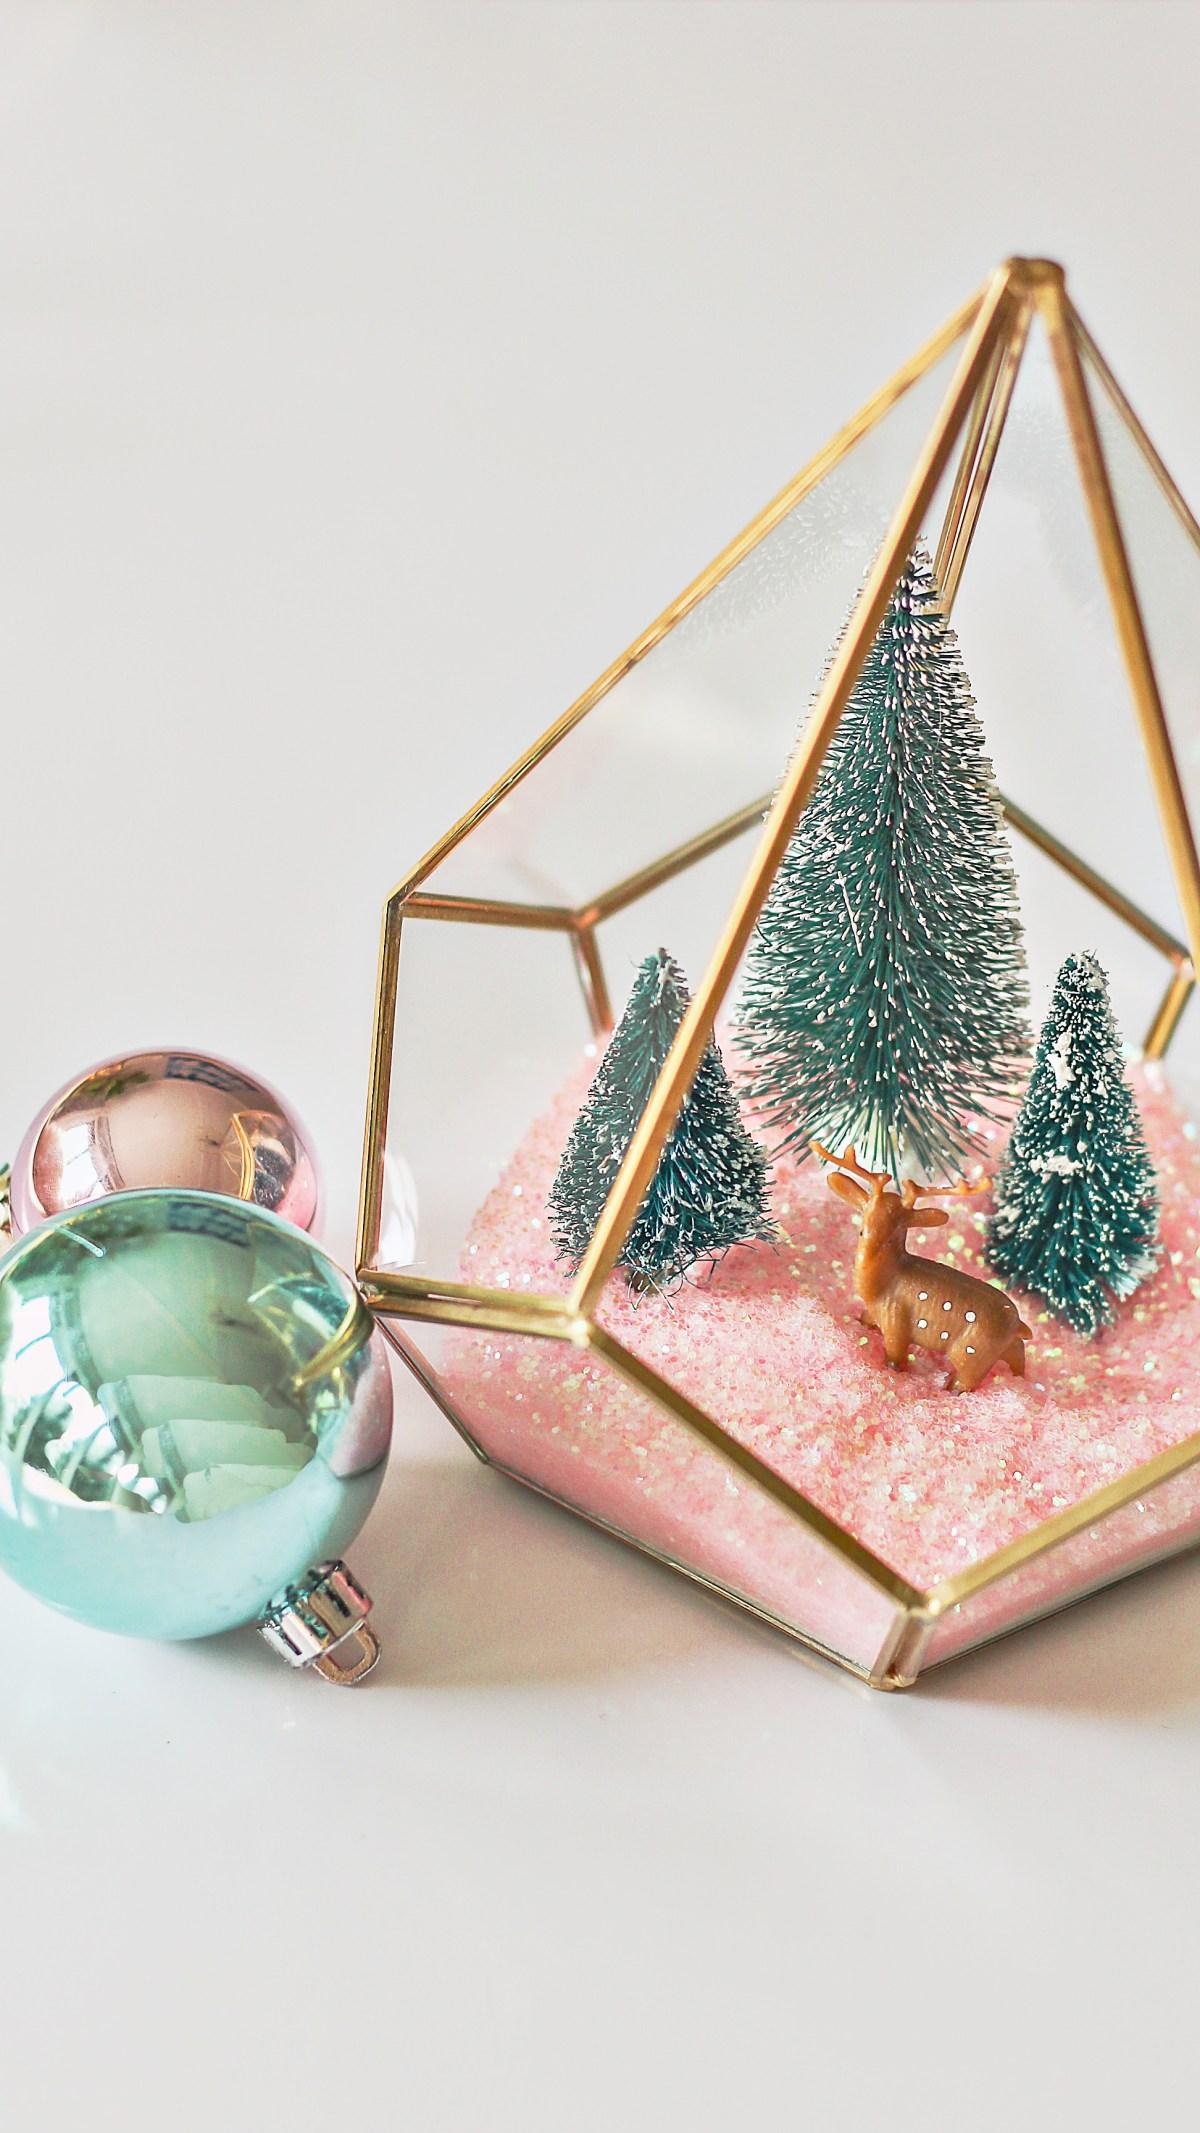 Modern Christmas terrarium diy. Great idea for modern Christmas decor.